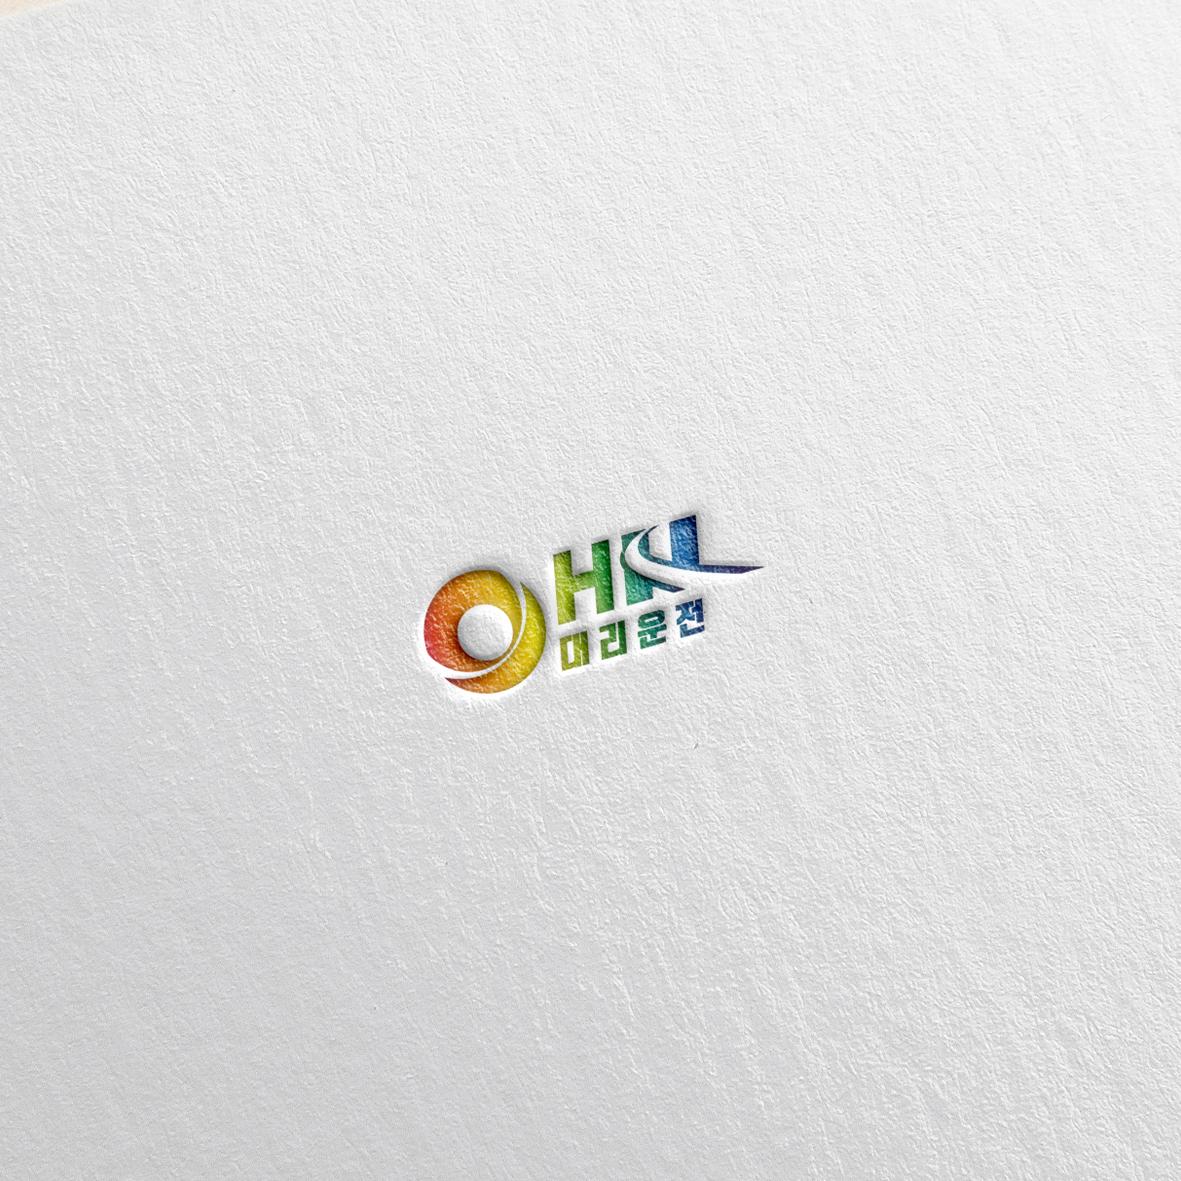 OHN 대리운전 로고 디자인